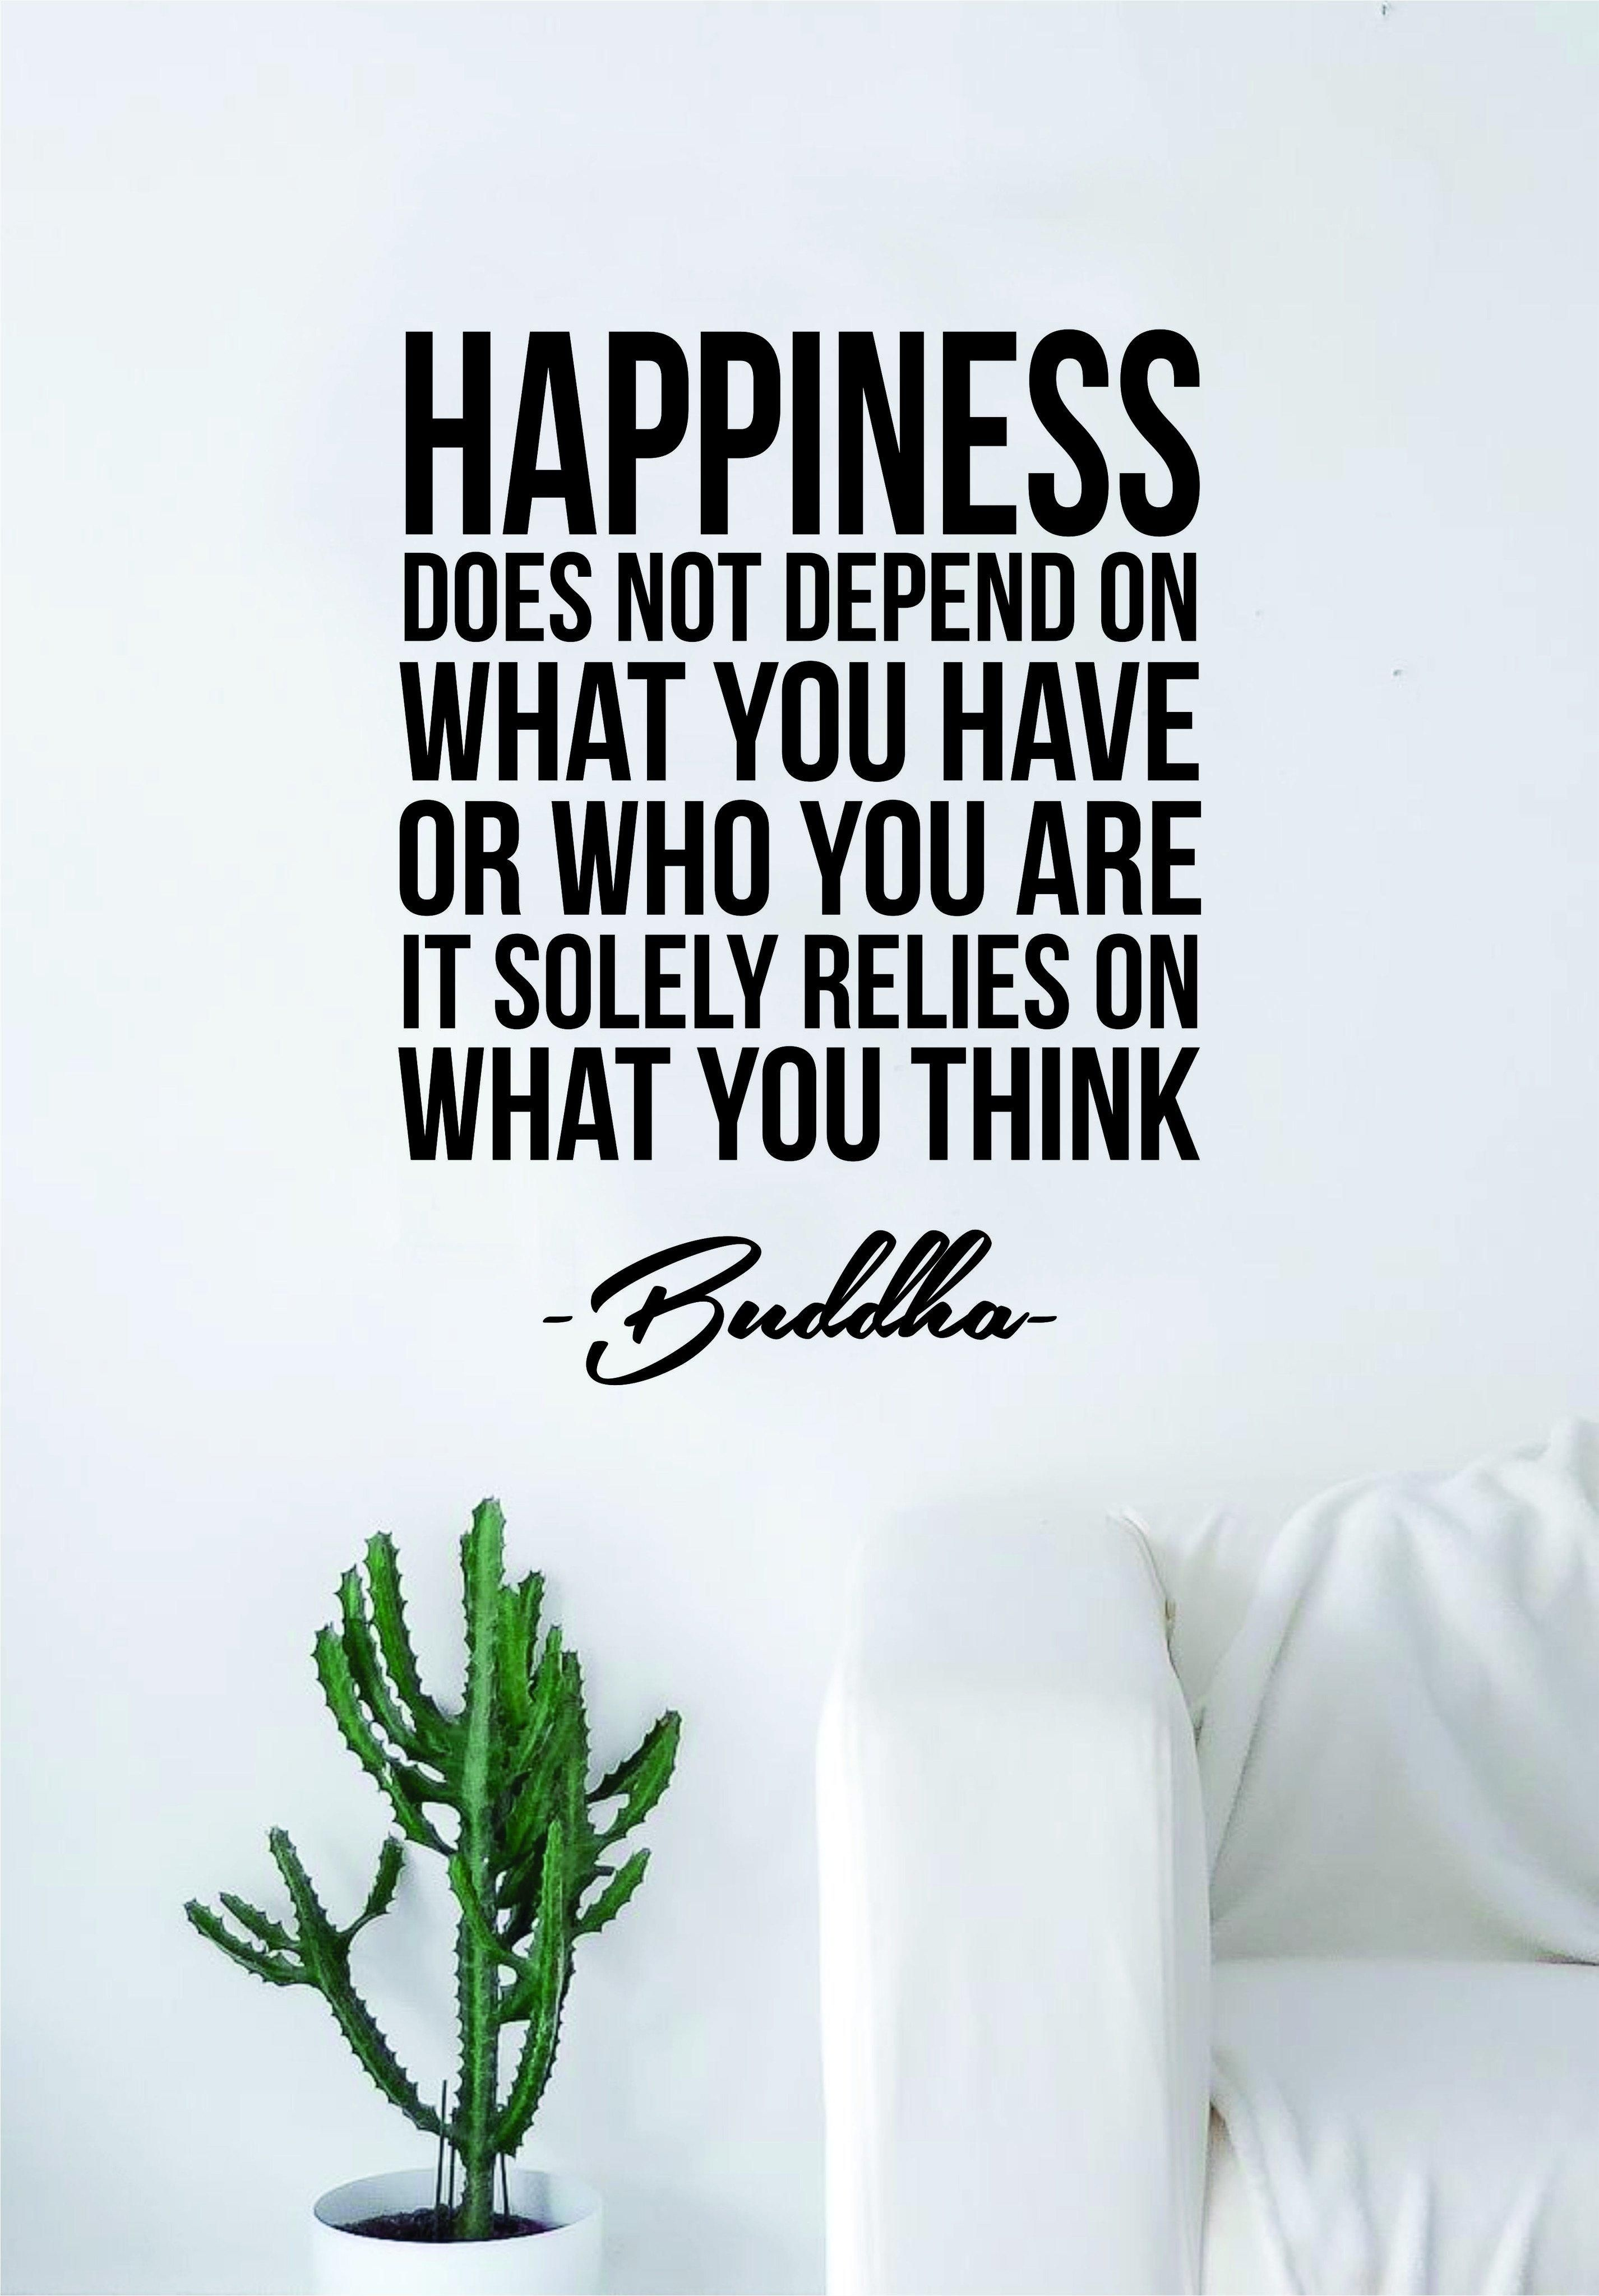 Buddha Happiness v2 Quote Wall Decal Sticker Vinyl Art Living Room Bedroom Decor Yoga Meditate Zen Inspirational